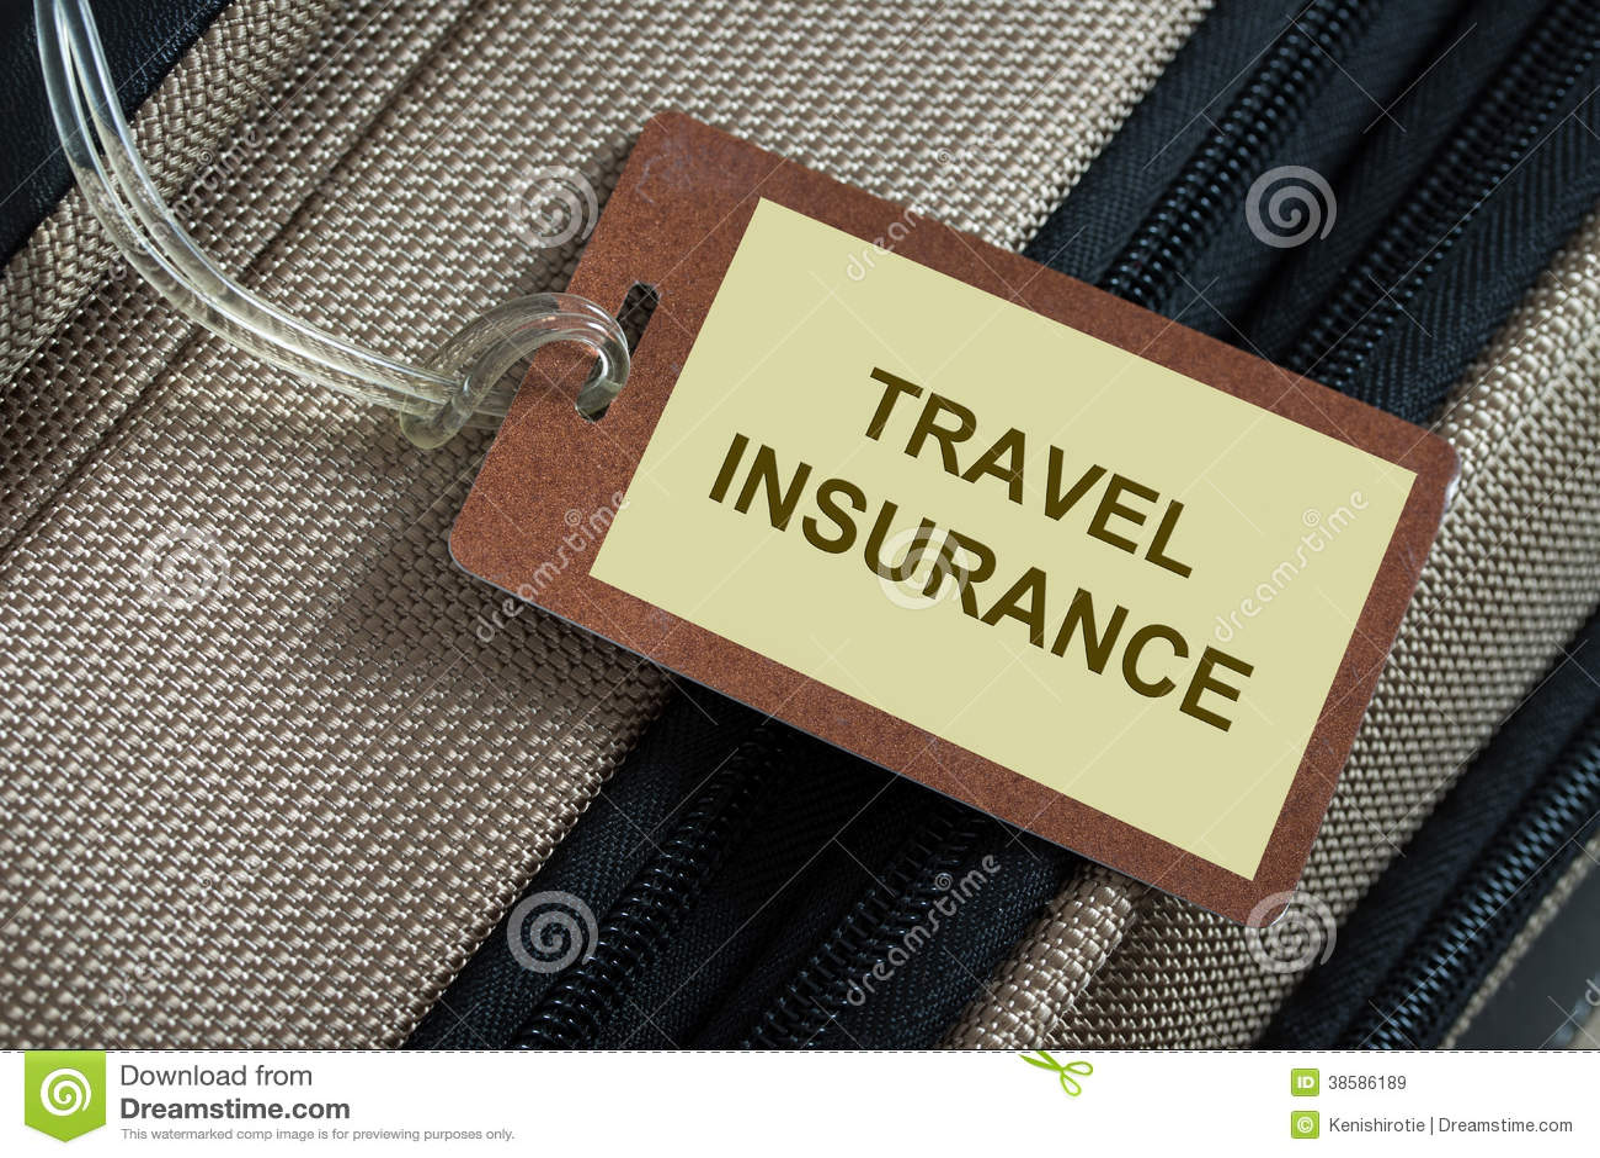 Travel Insurance Royalty Free Stock Images - Image: 38586189